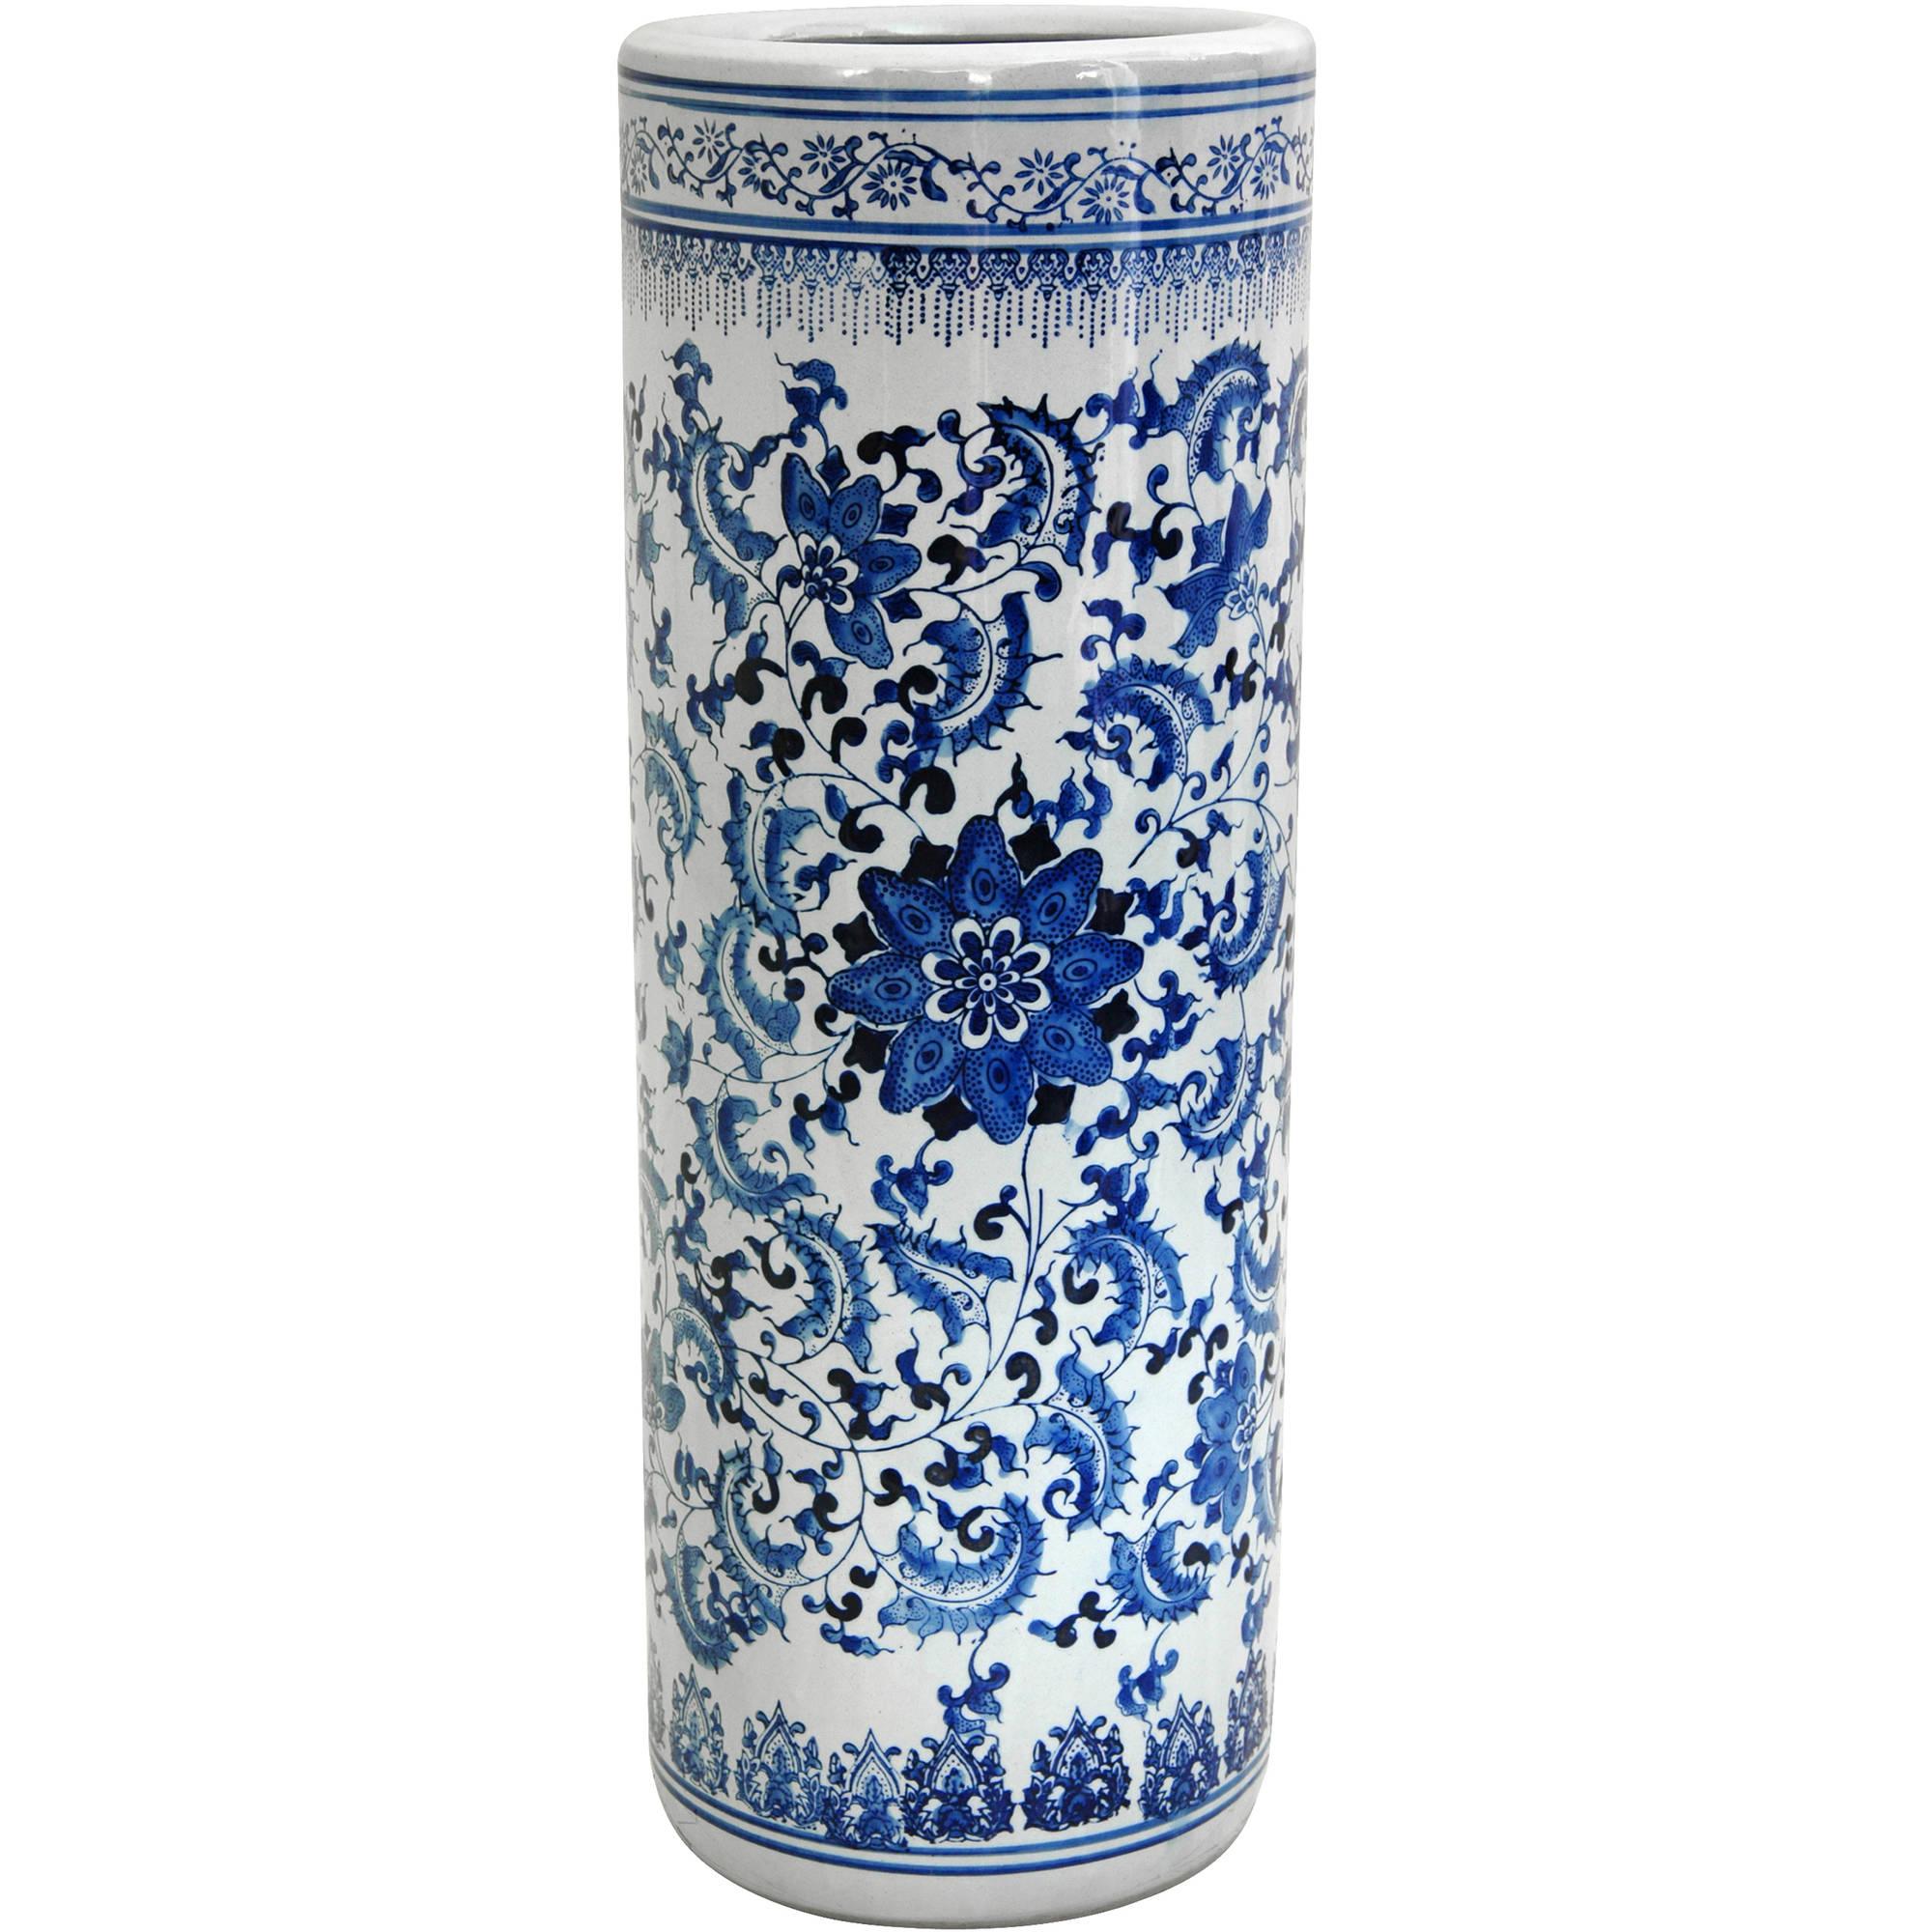 "24"" Floral Blue & White Porcelain Umbrella Stand"